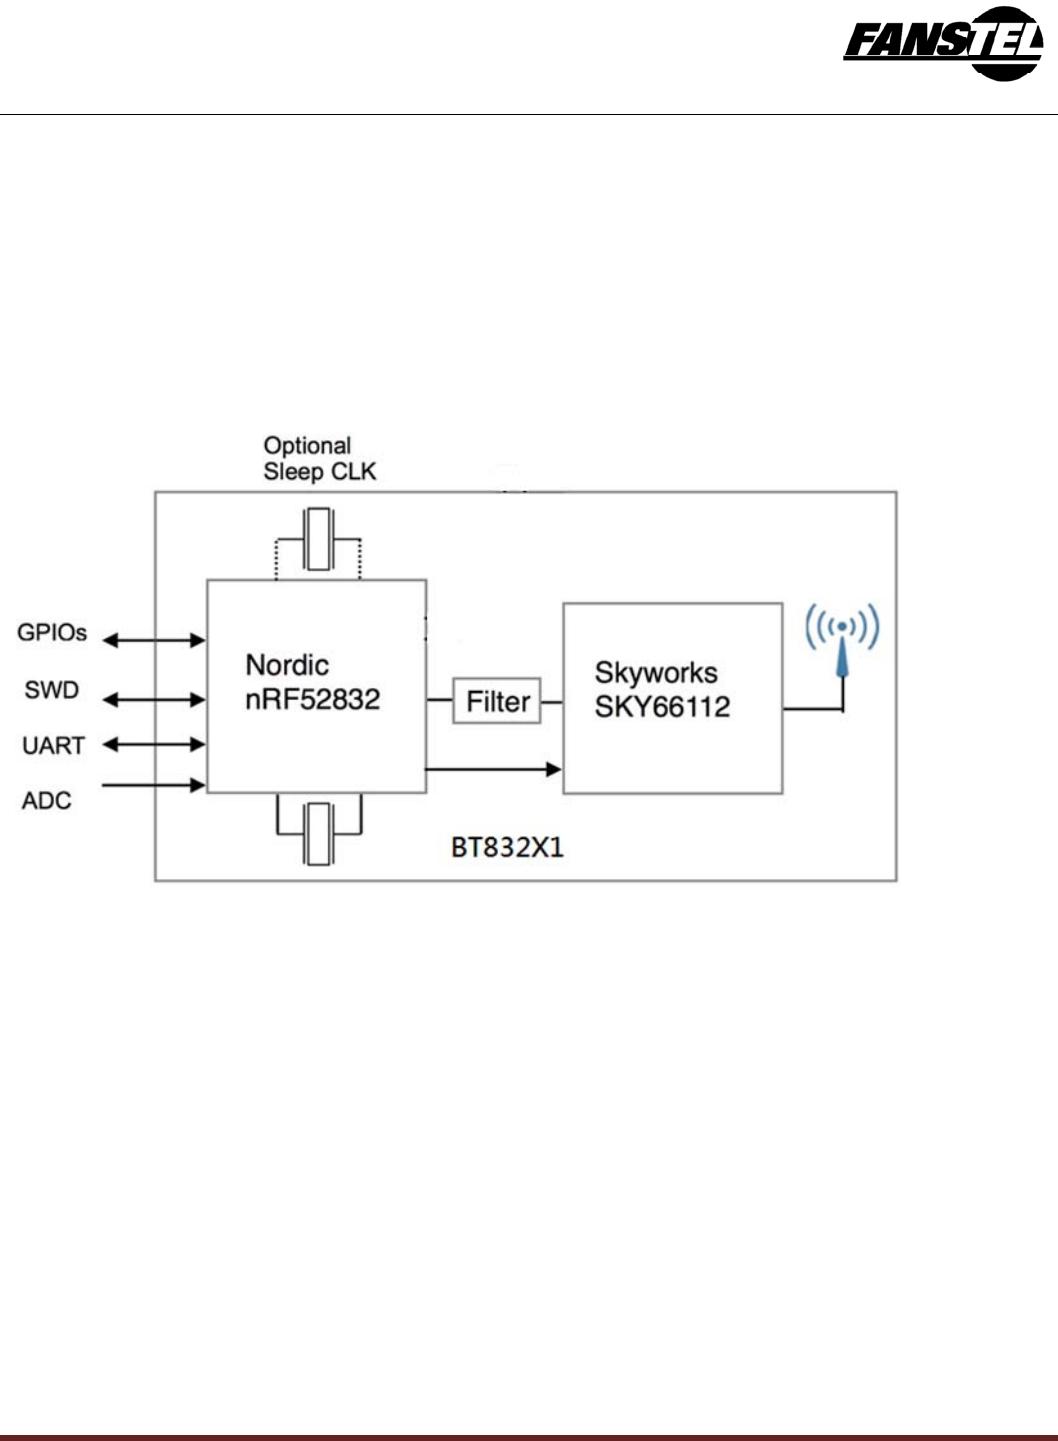 Fanstel Taipei BT832XE Bluetooth 5 0 Module User Manual